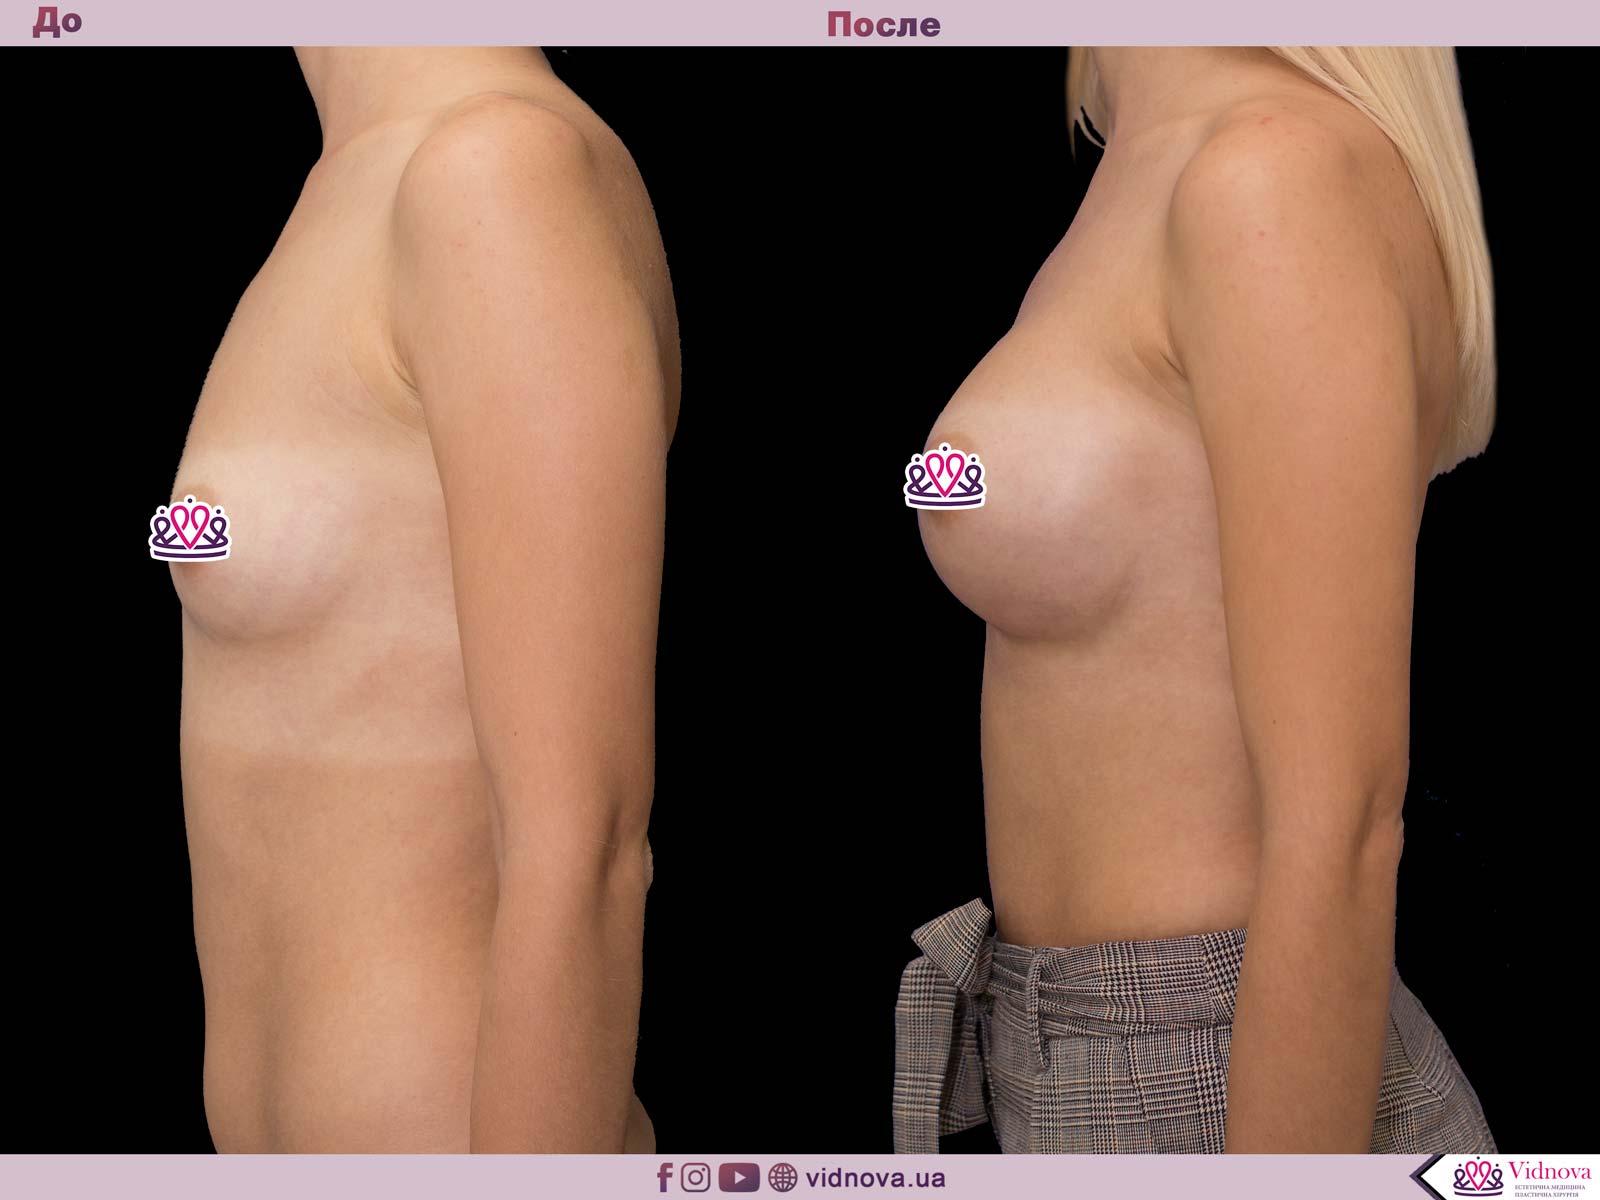 Увеличение груди: Фото ДО и ПОСЛЕ - Пример №47-3 - Клиника Vidnova